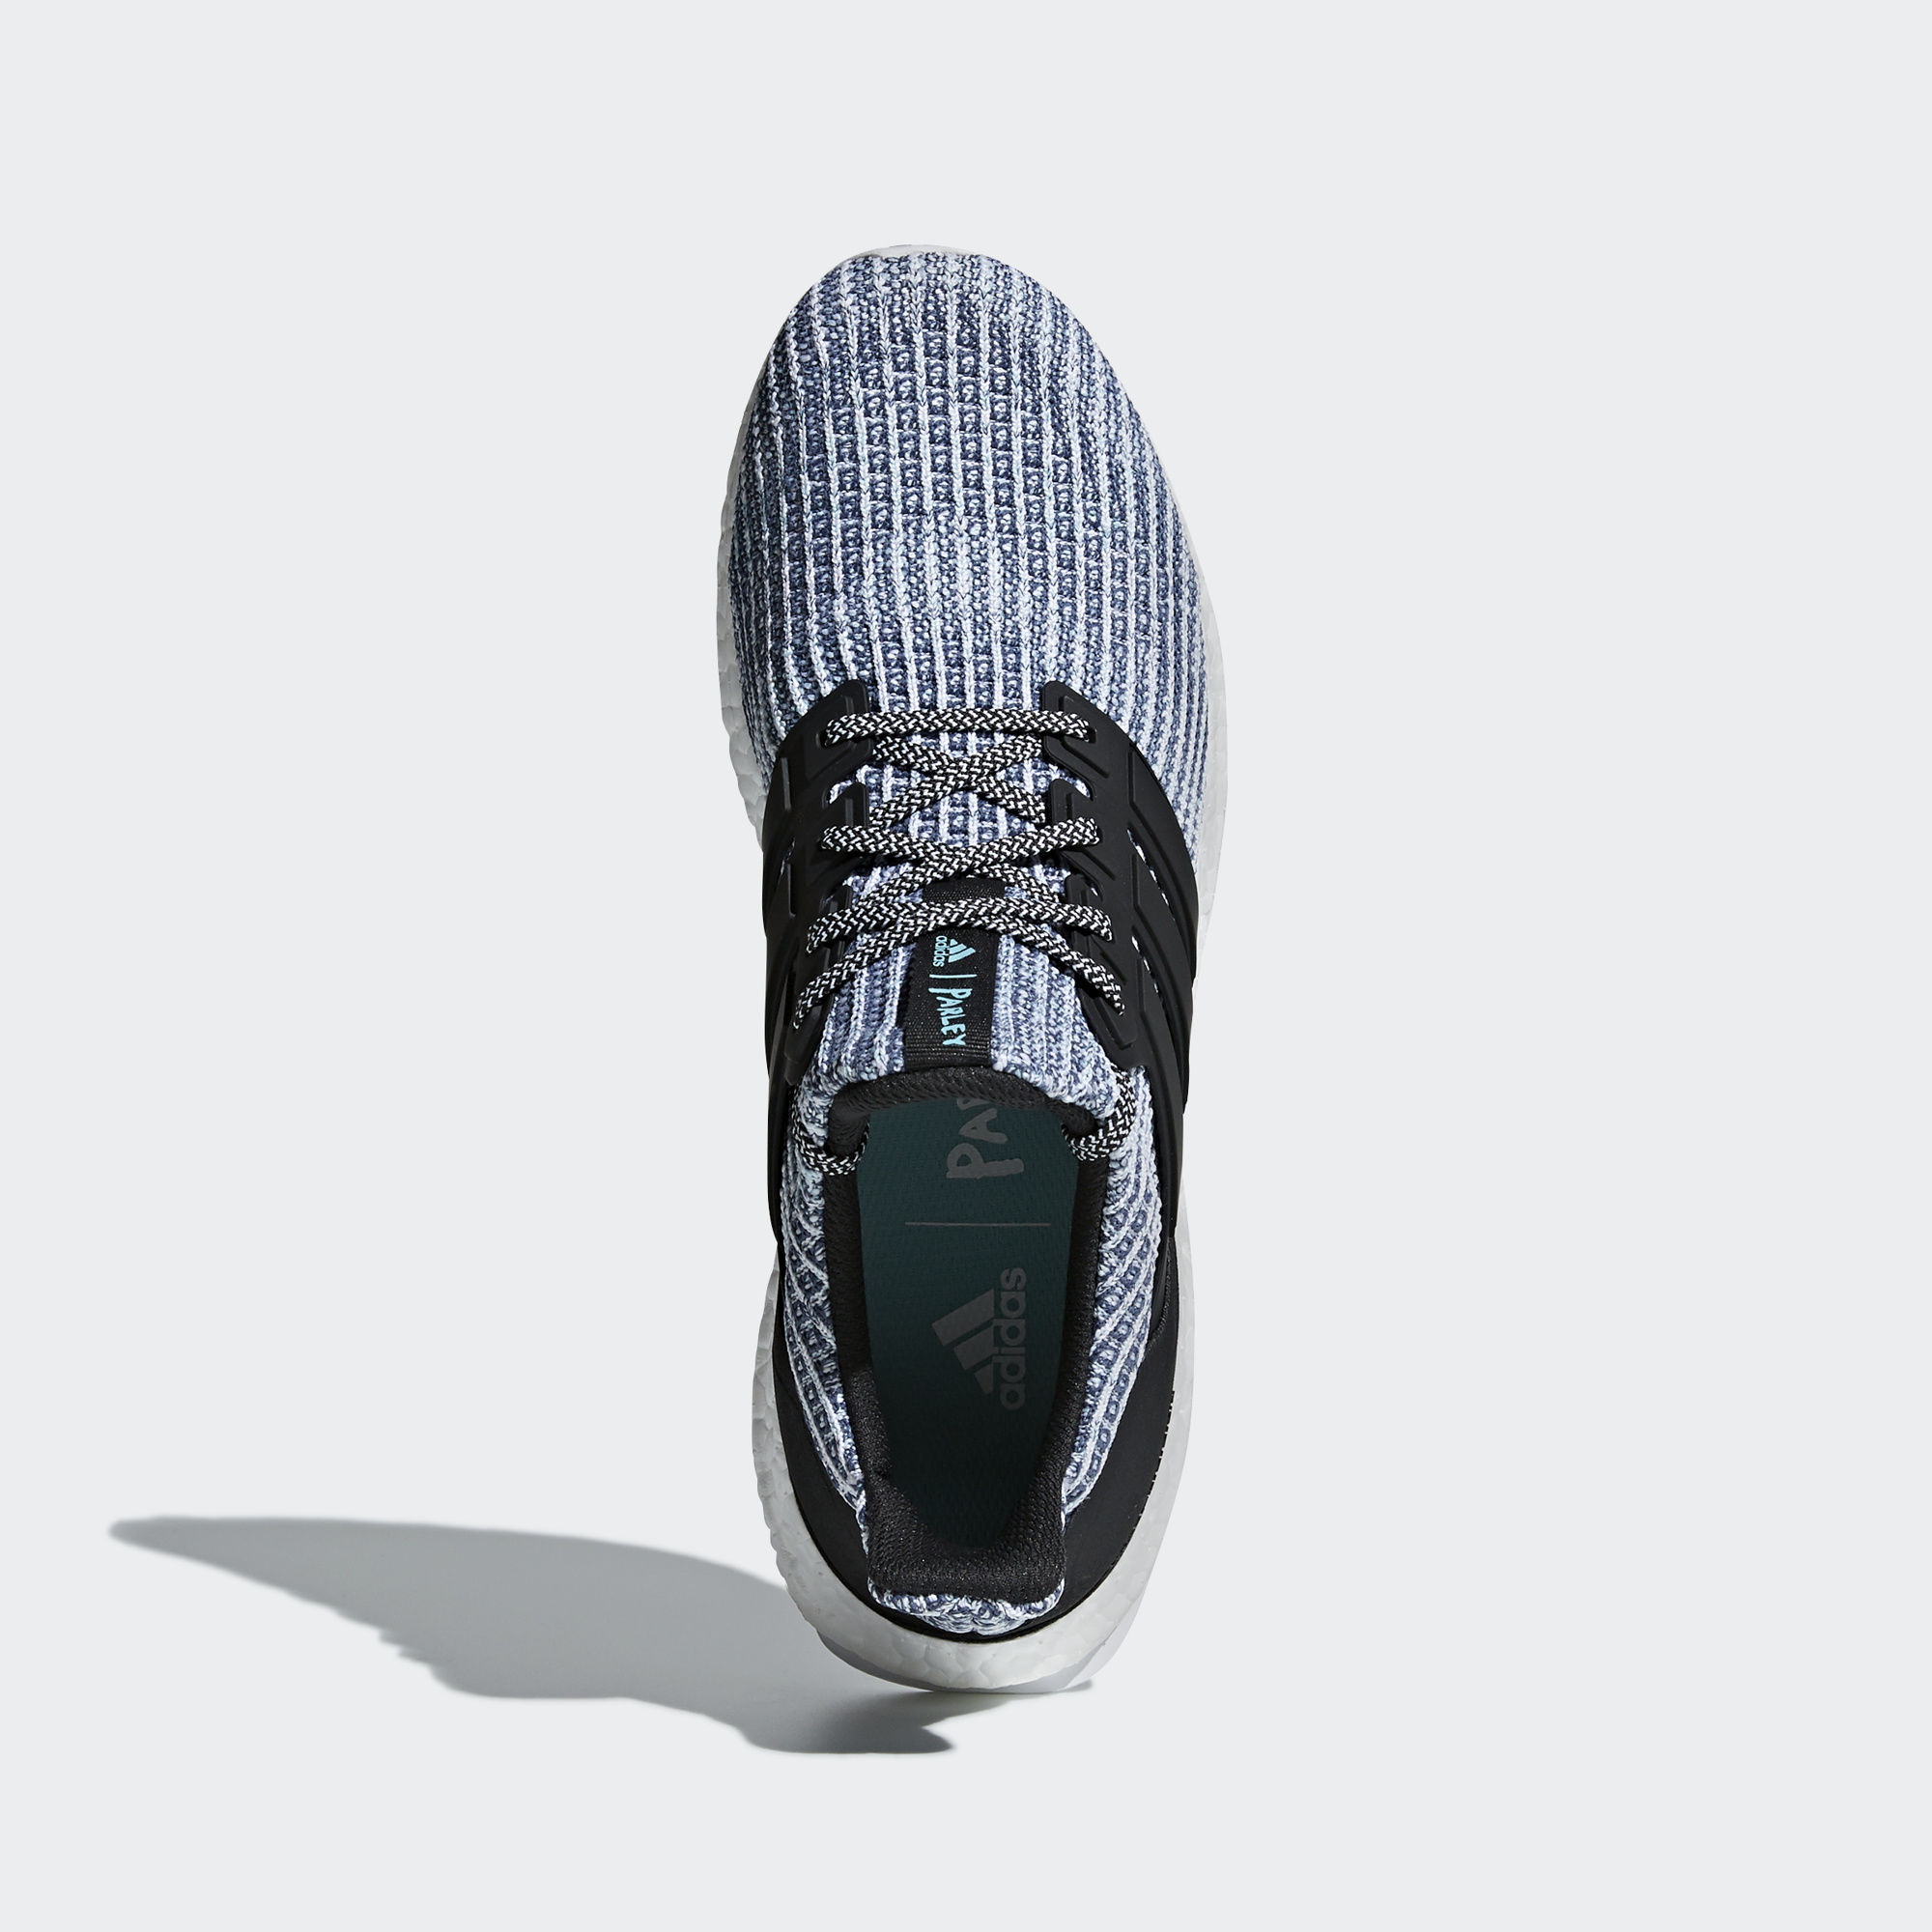 Adidas Ultraboost Ftwr White / Carbon / Blue Spirit (BC0248)